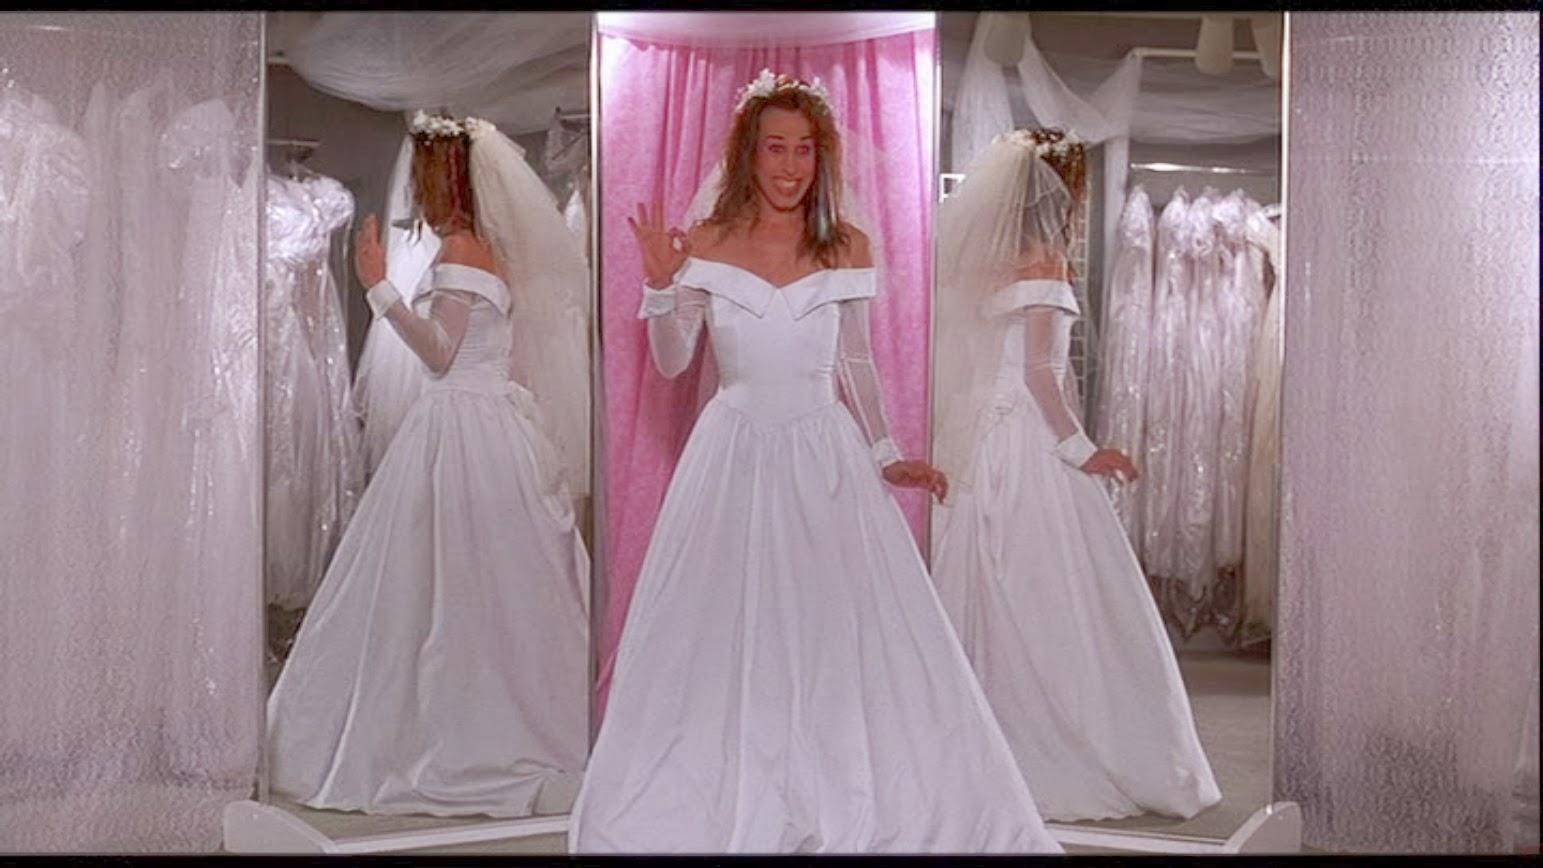 Happyotter THE WEDDING SINGER 1998